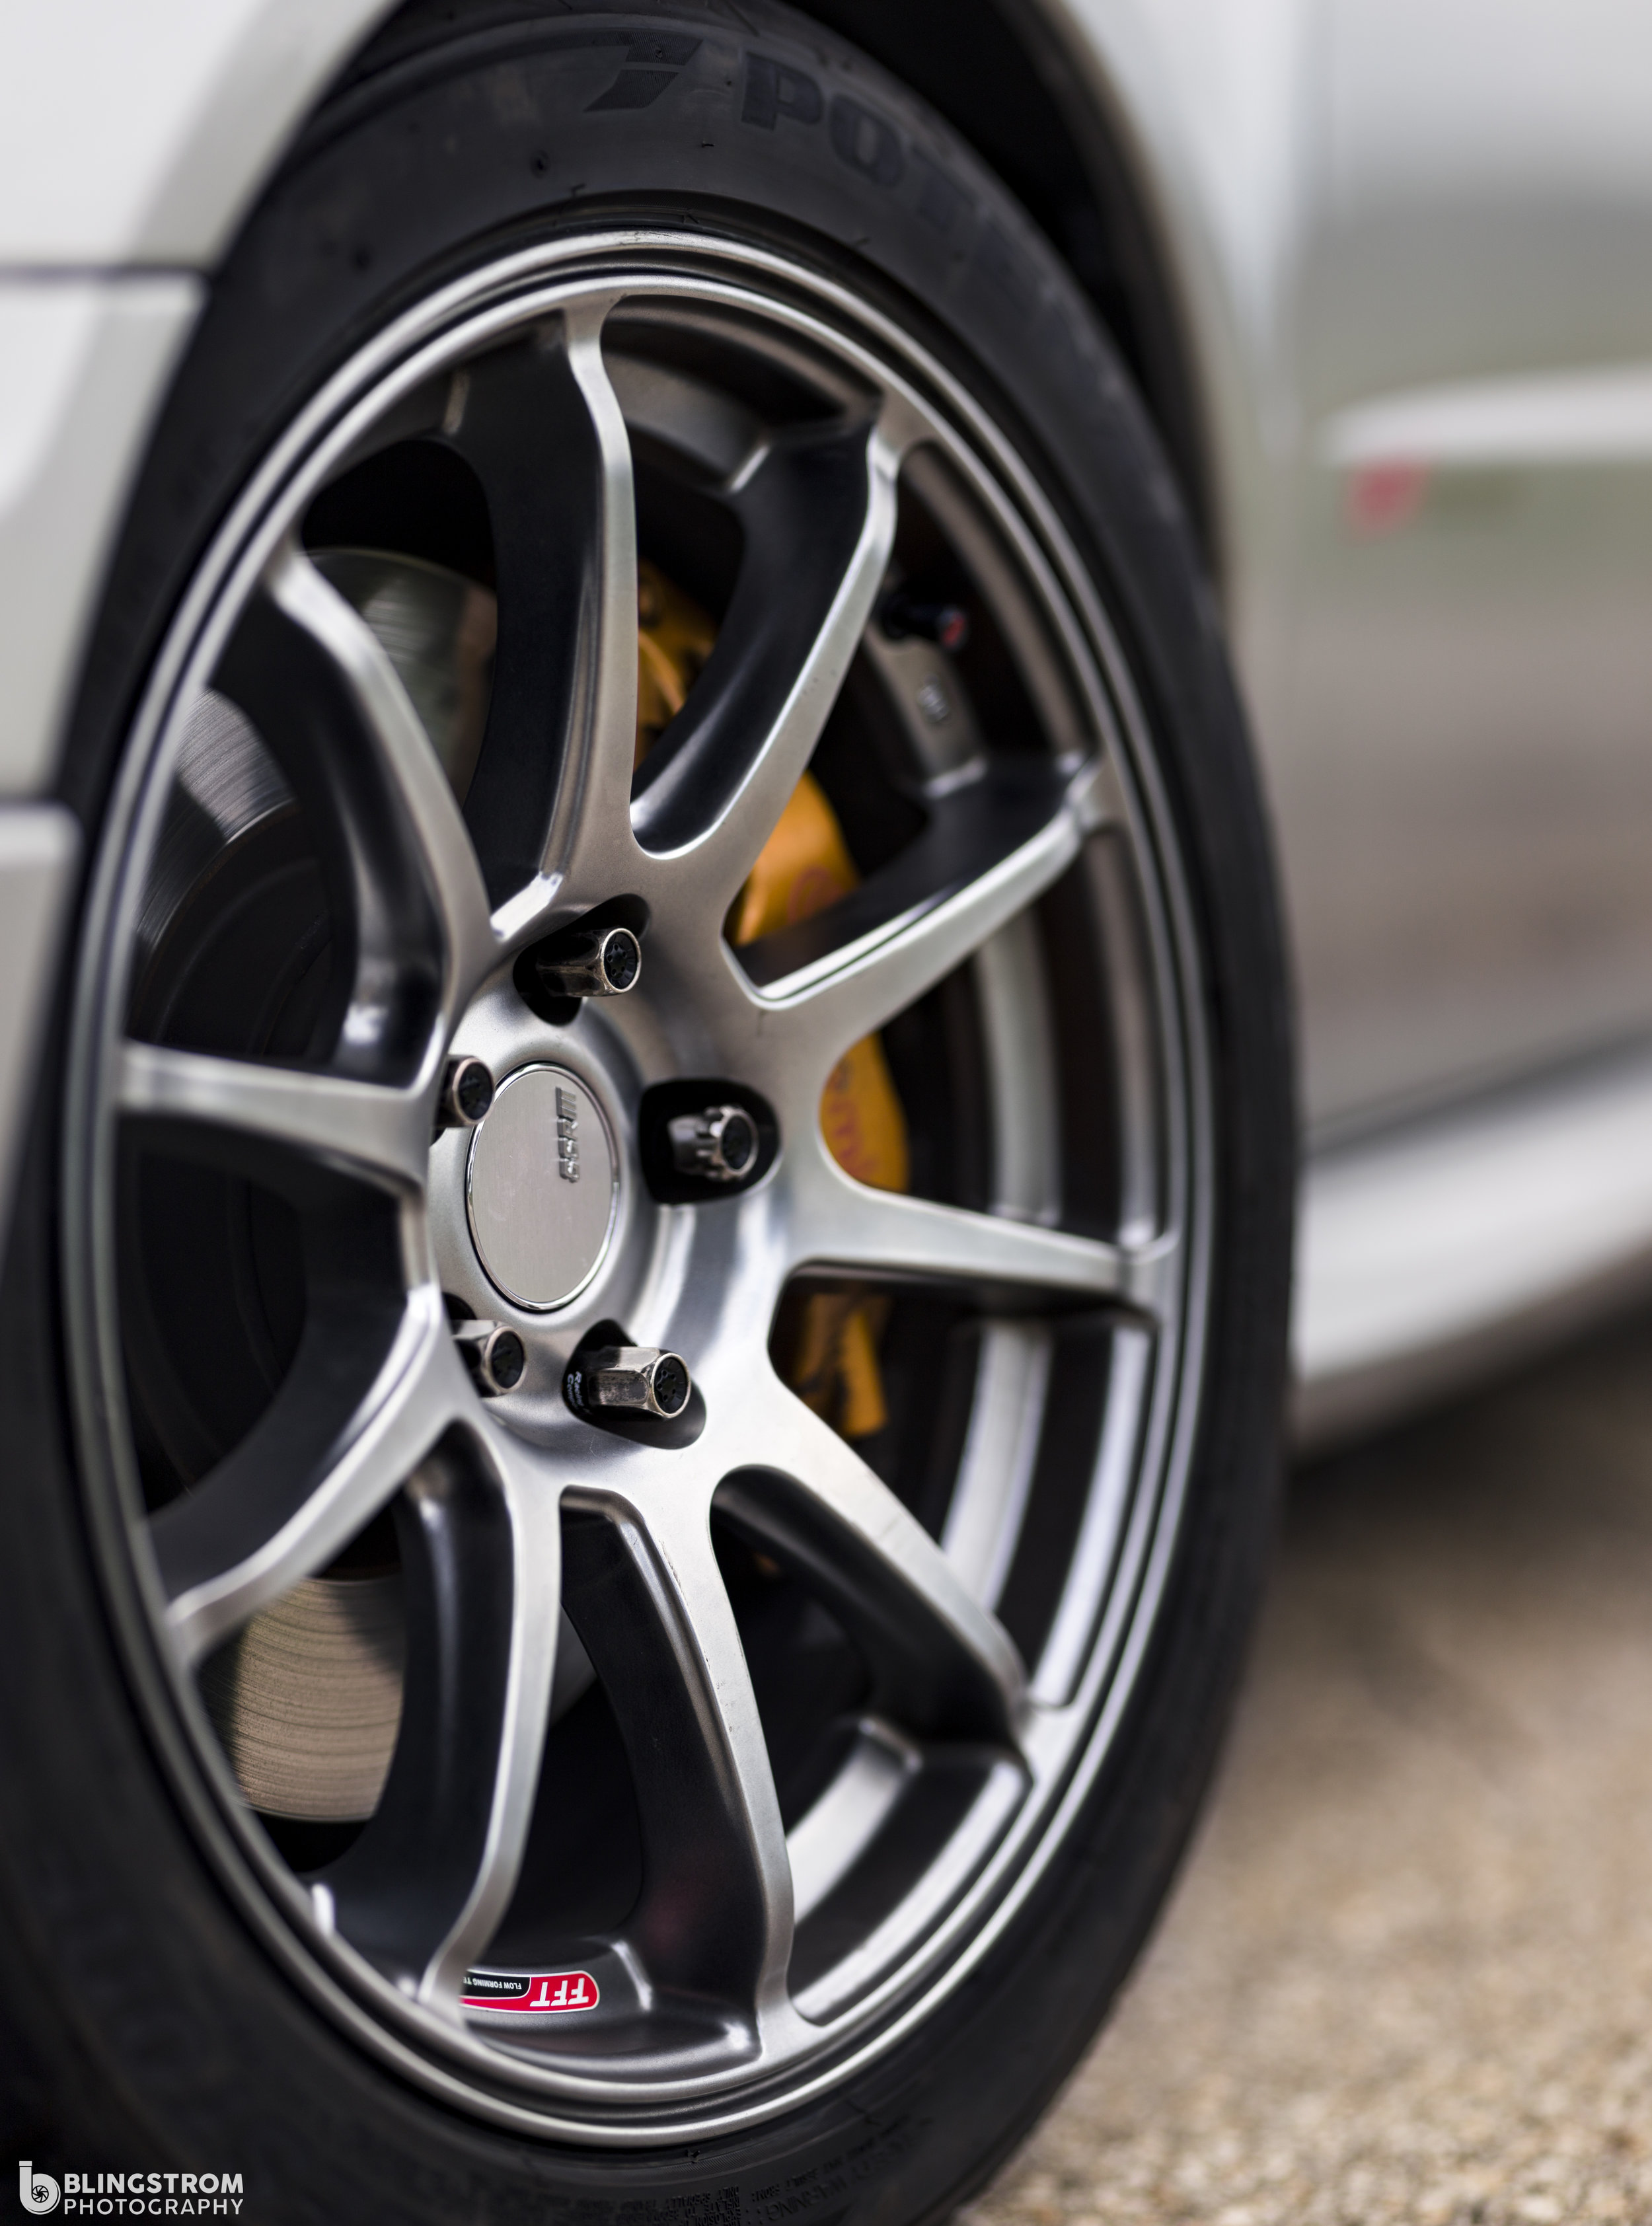 sti front left tire-5.jpg